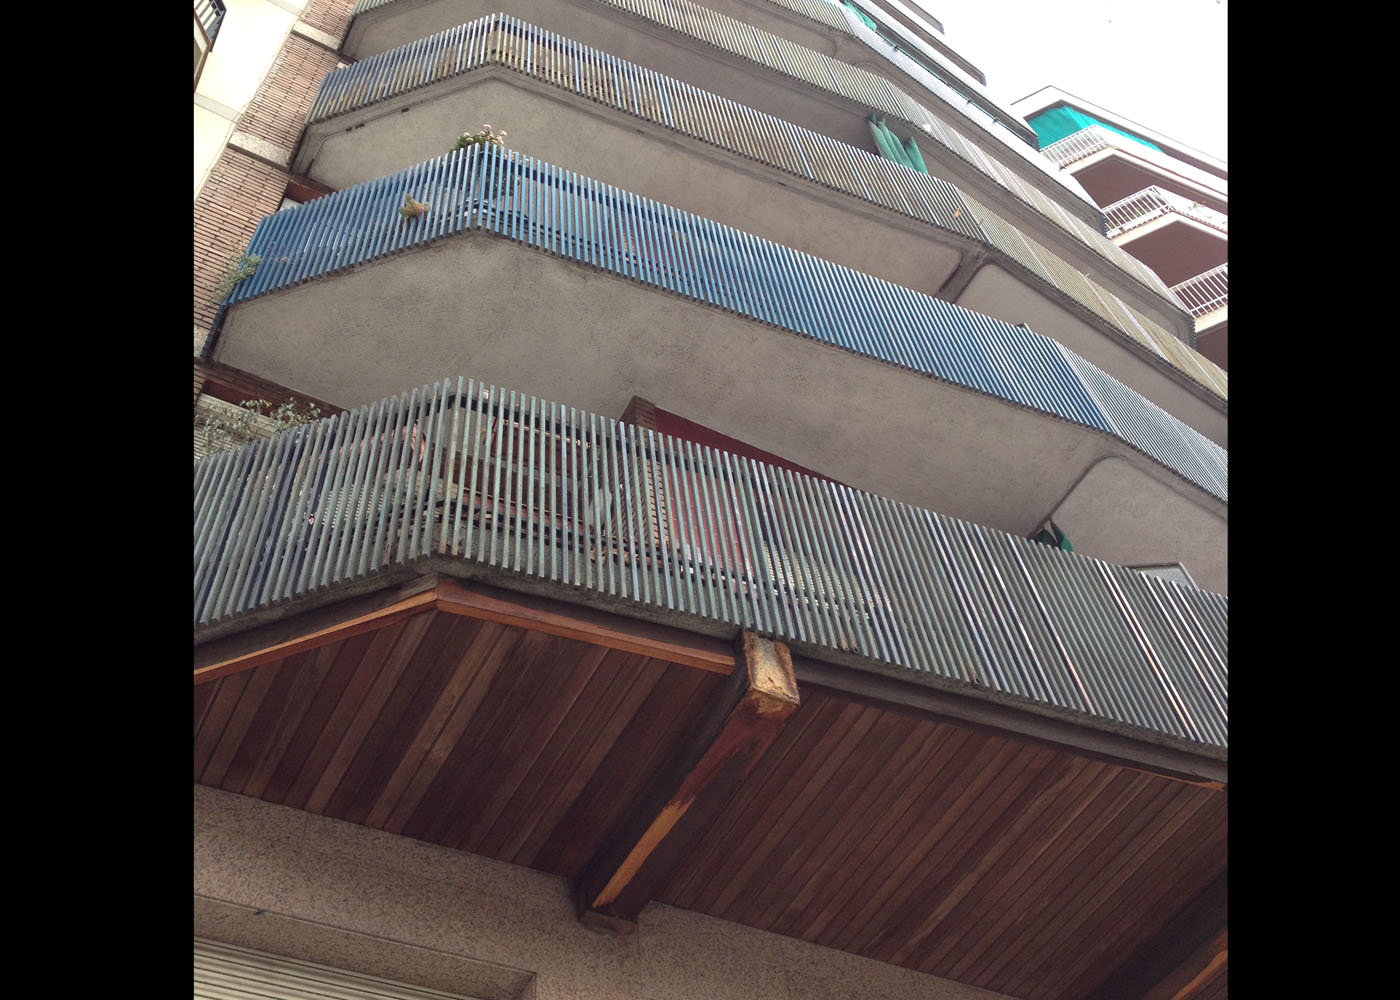 rehabilitacion-vivienda-plurifamiliar-passeig-de-lluis-companys-6-barcelona-04